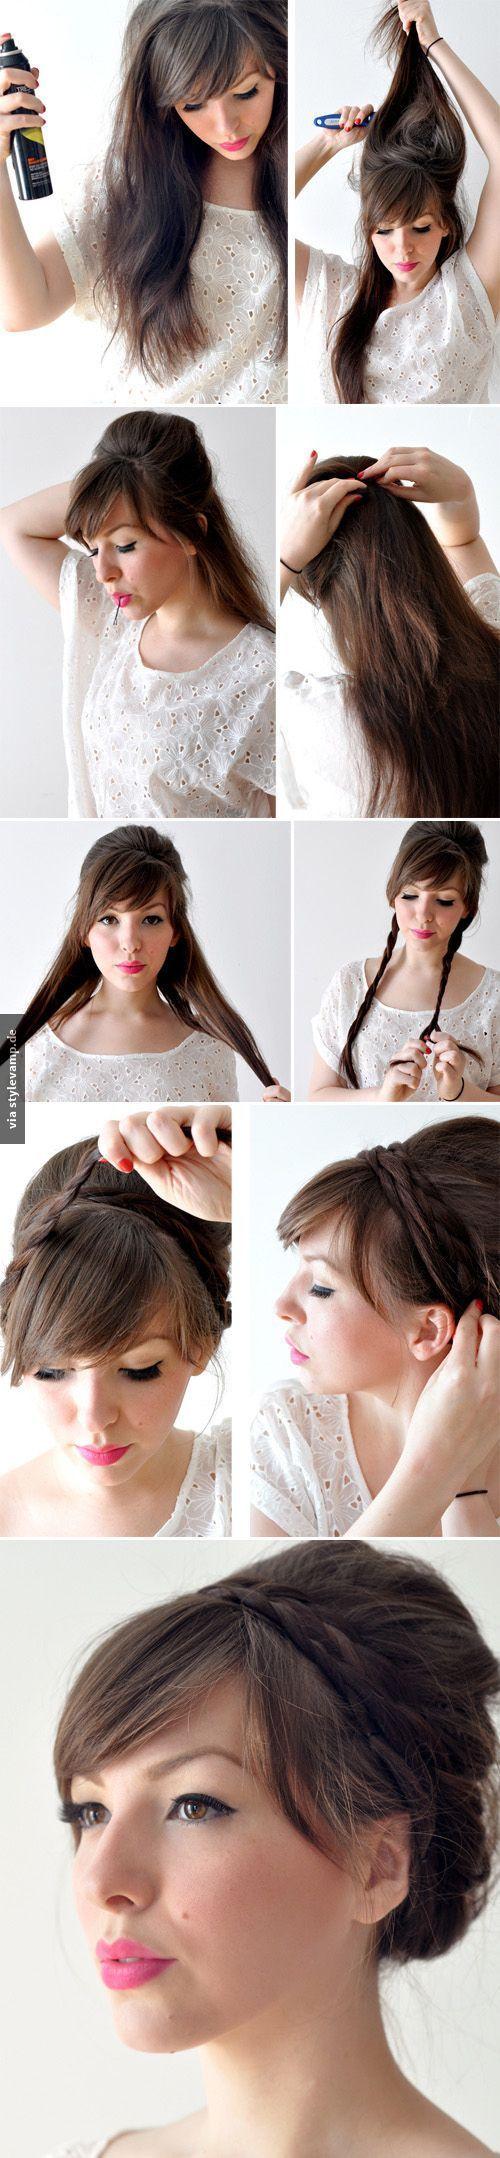 Verrückte Frisur